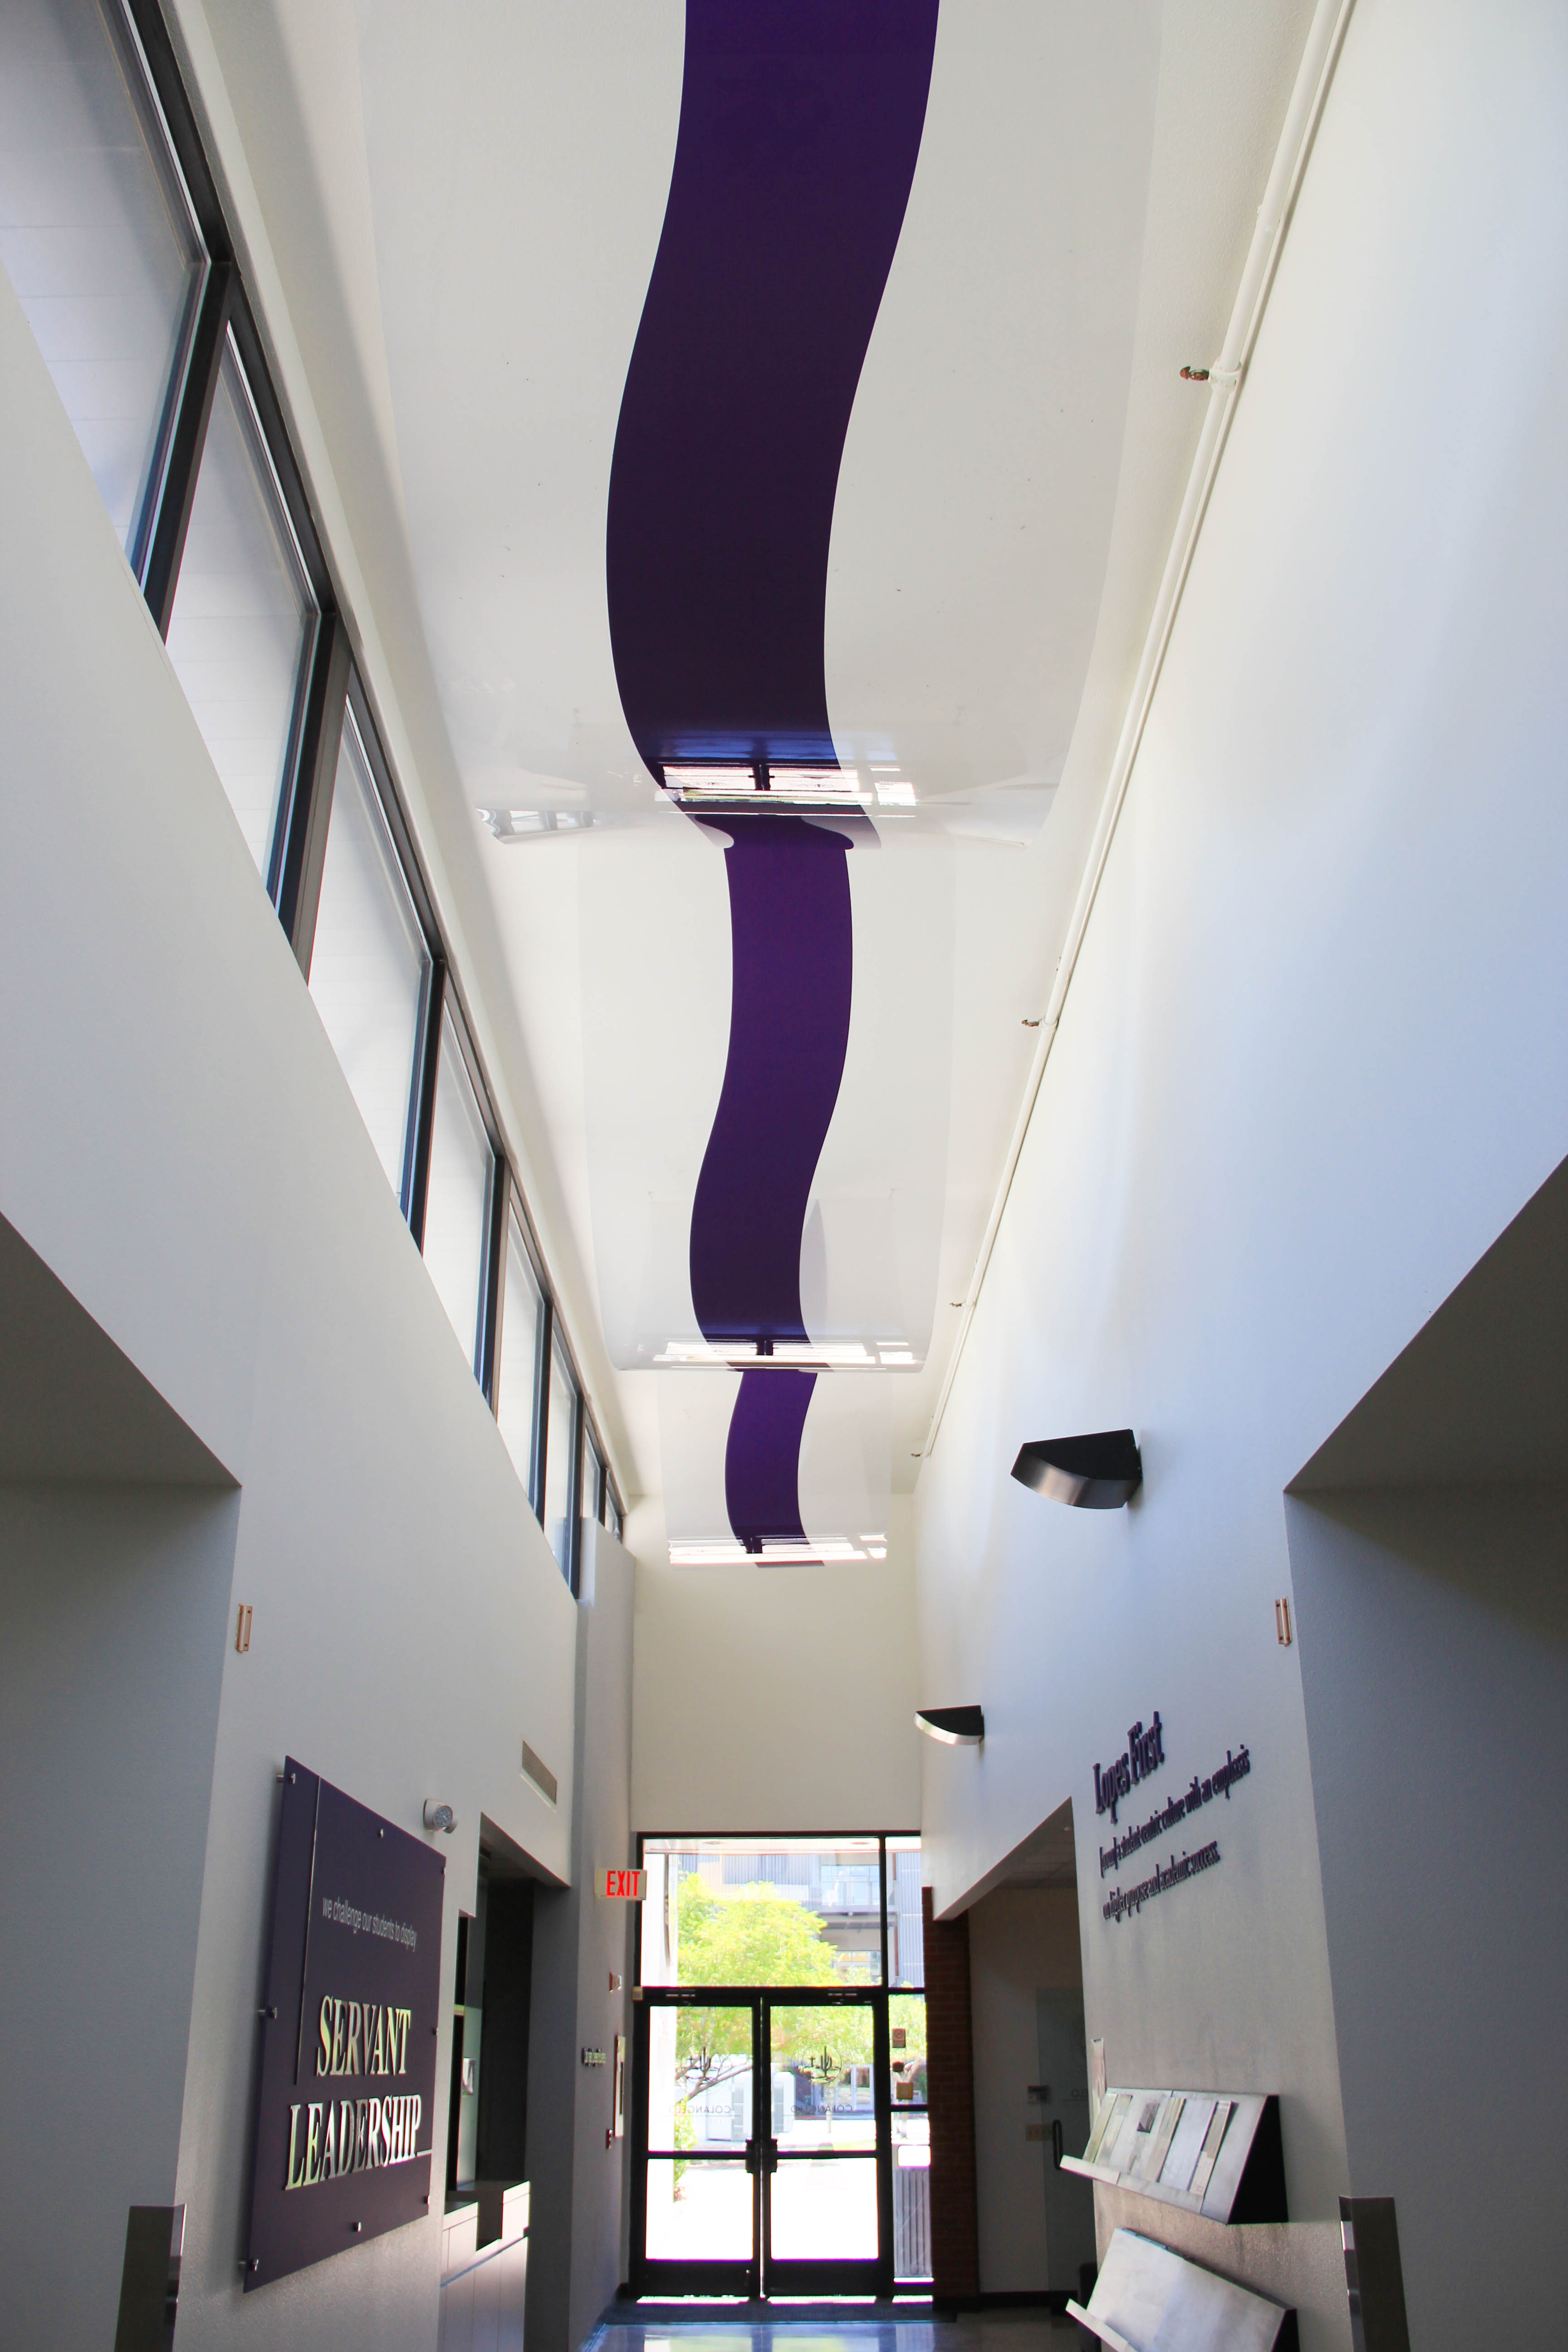 custom environmental graphics on GCU ceiling